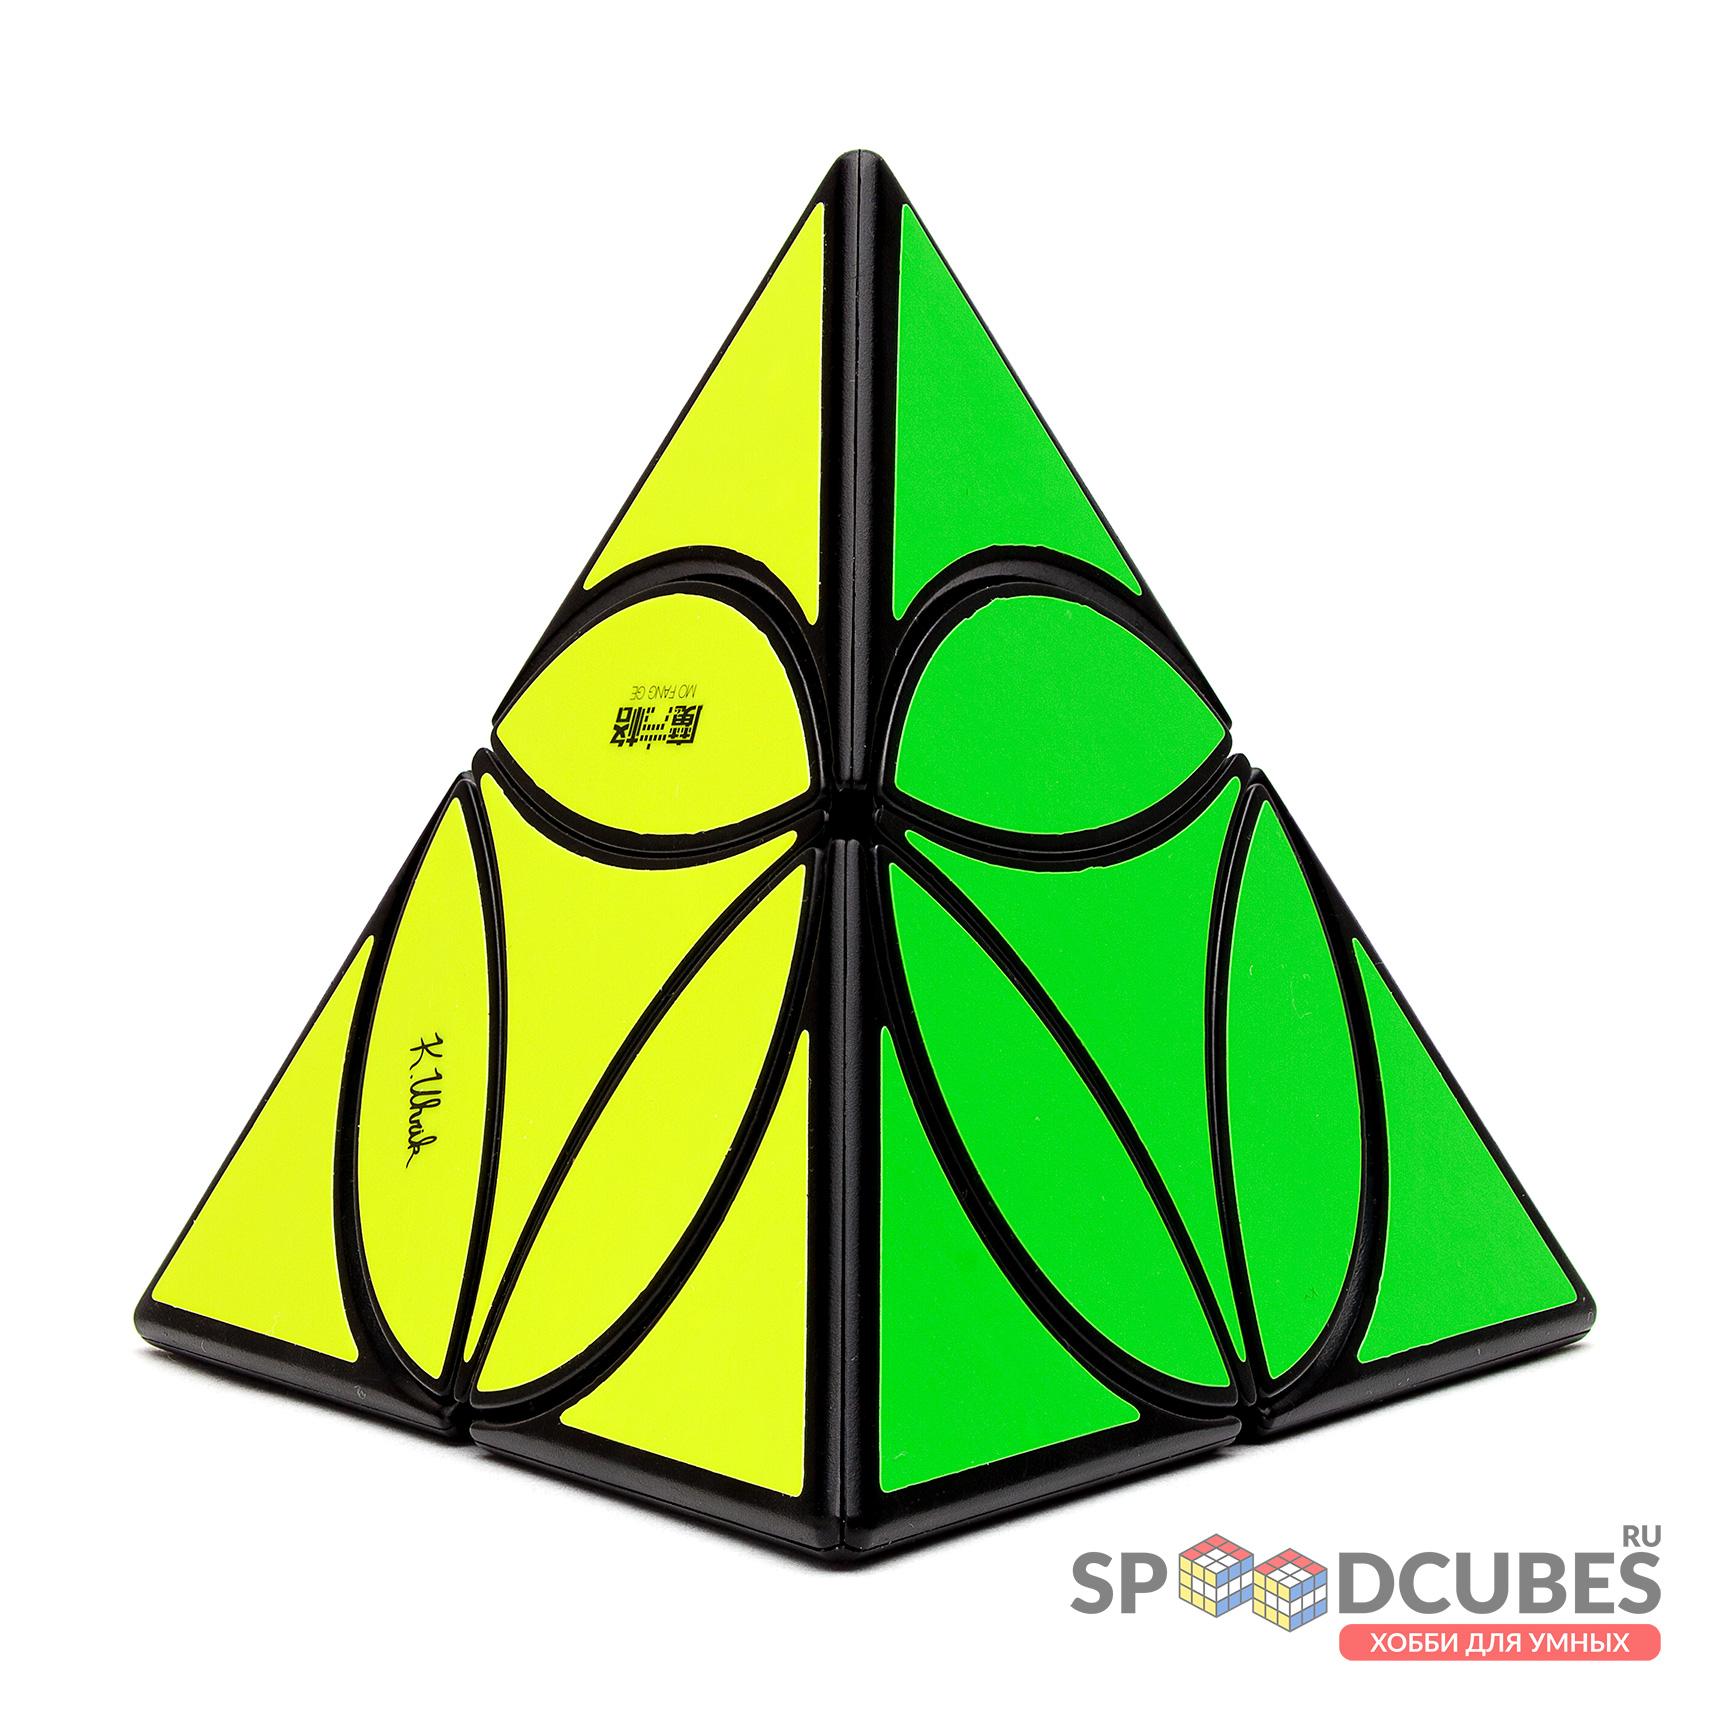 QiYi (MoFangGe) Coin Tetrahedron